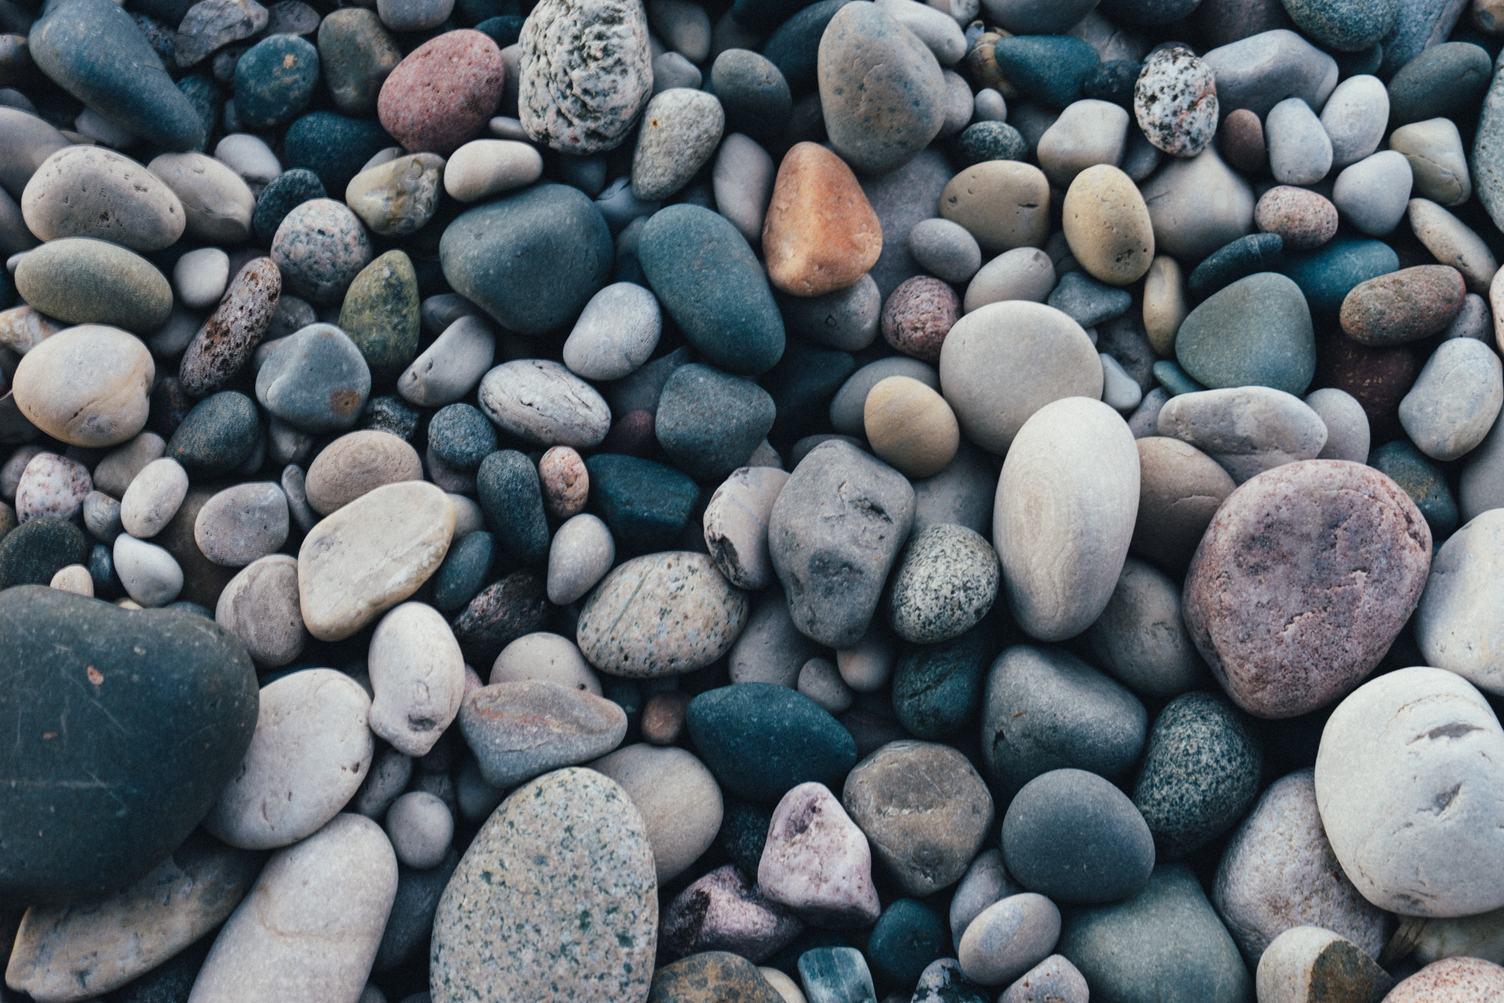 Closeup of Colorful Pebbles